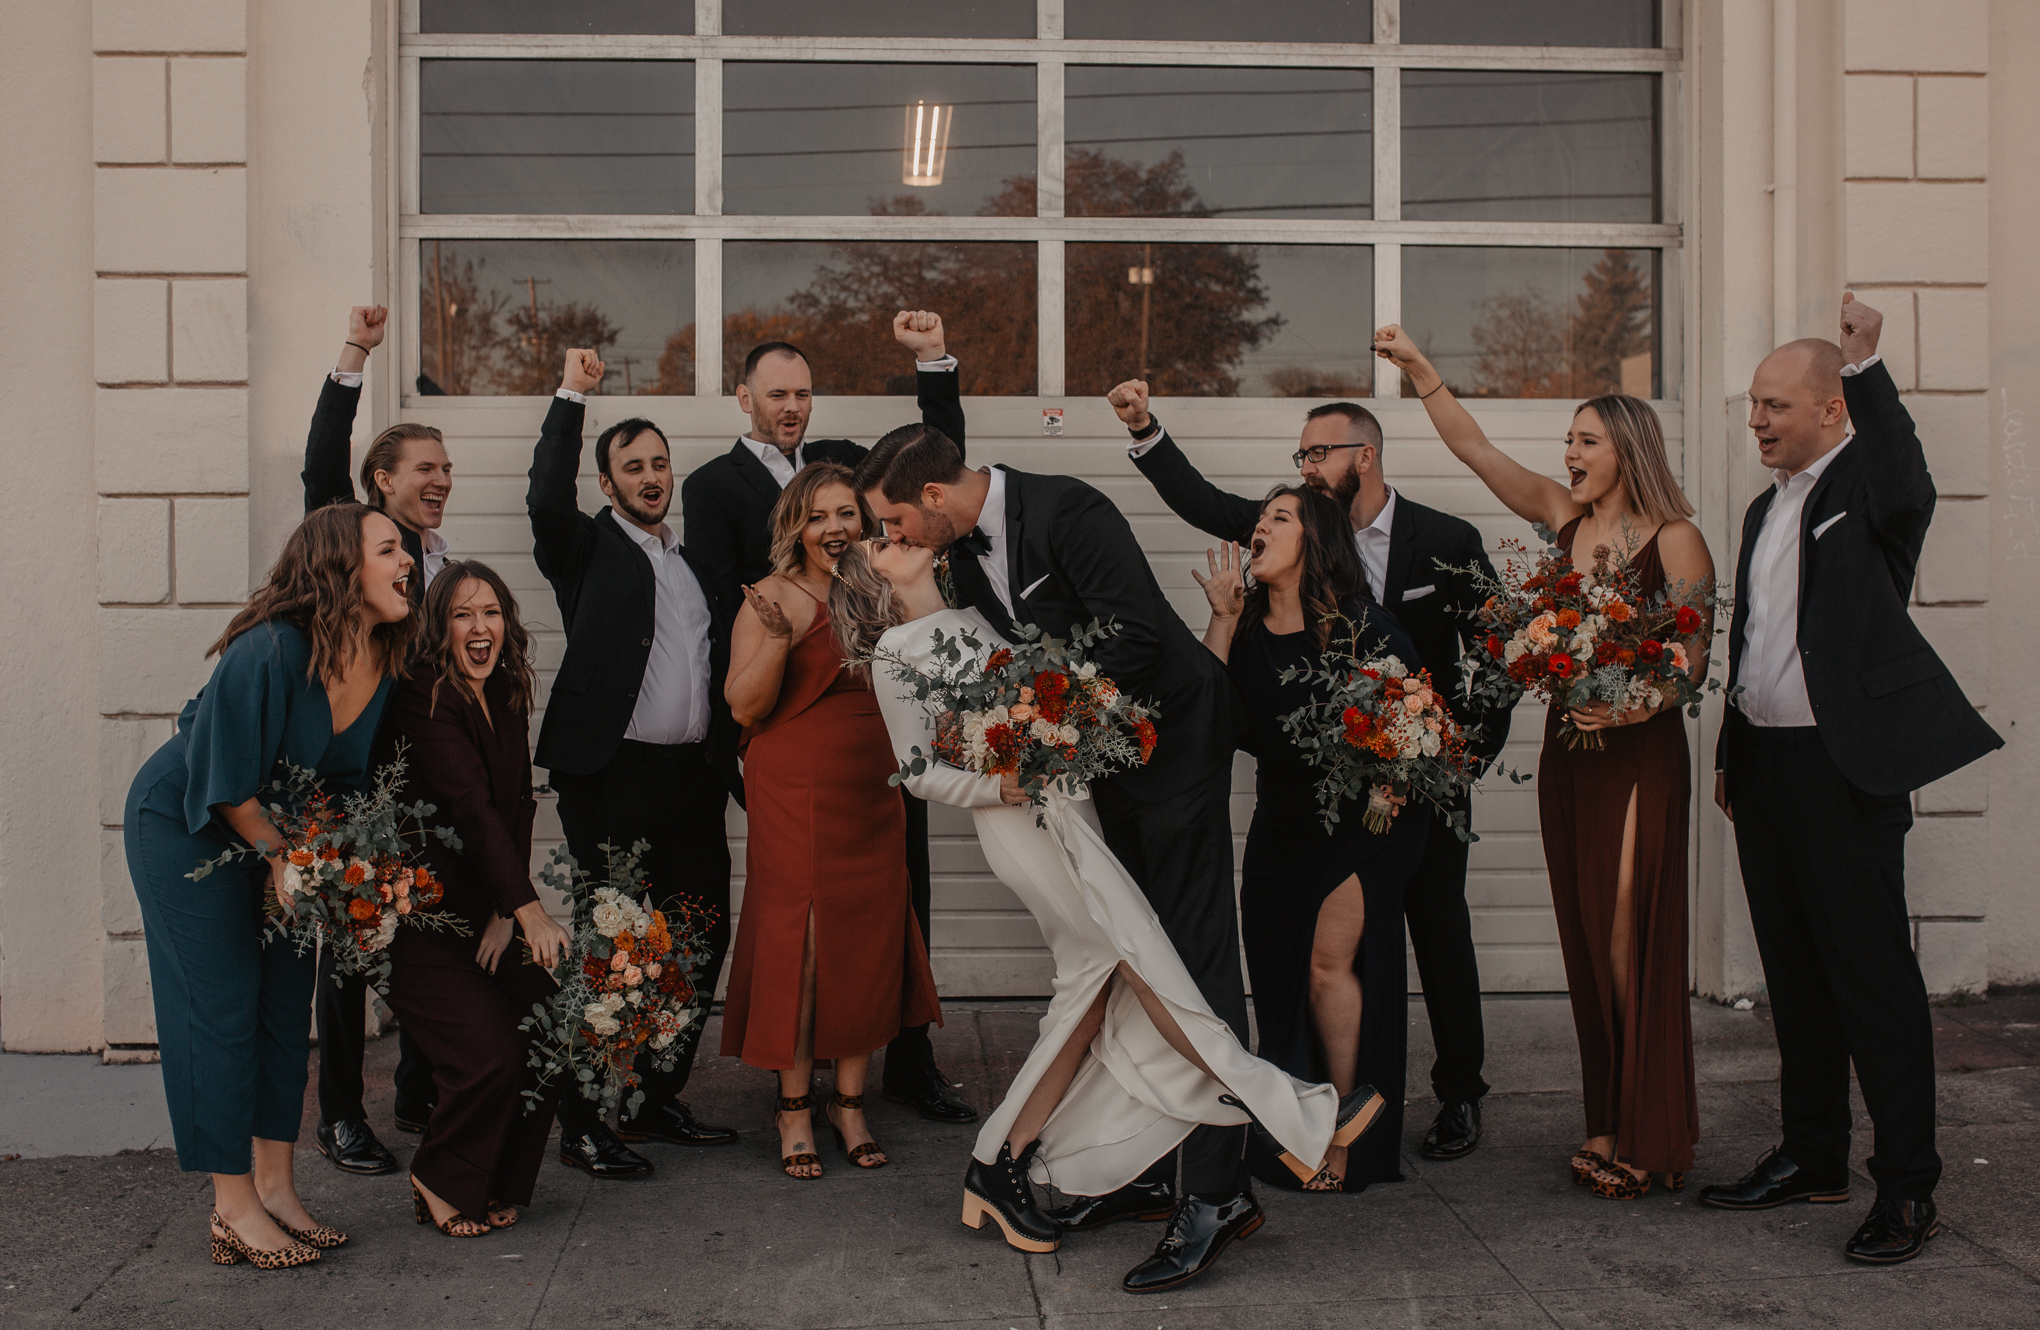 union-pine-urban-portland-trendy-wedding-142.jpg